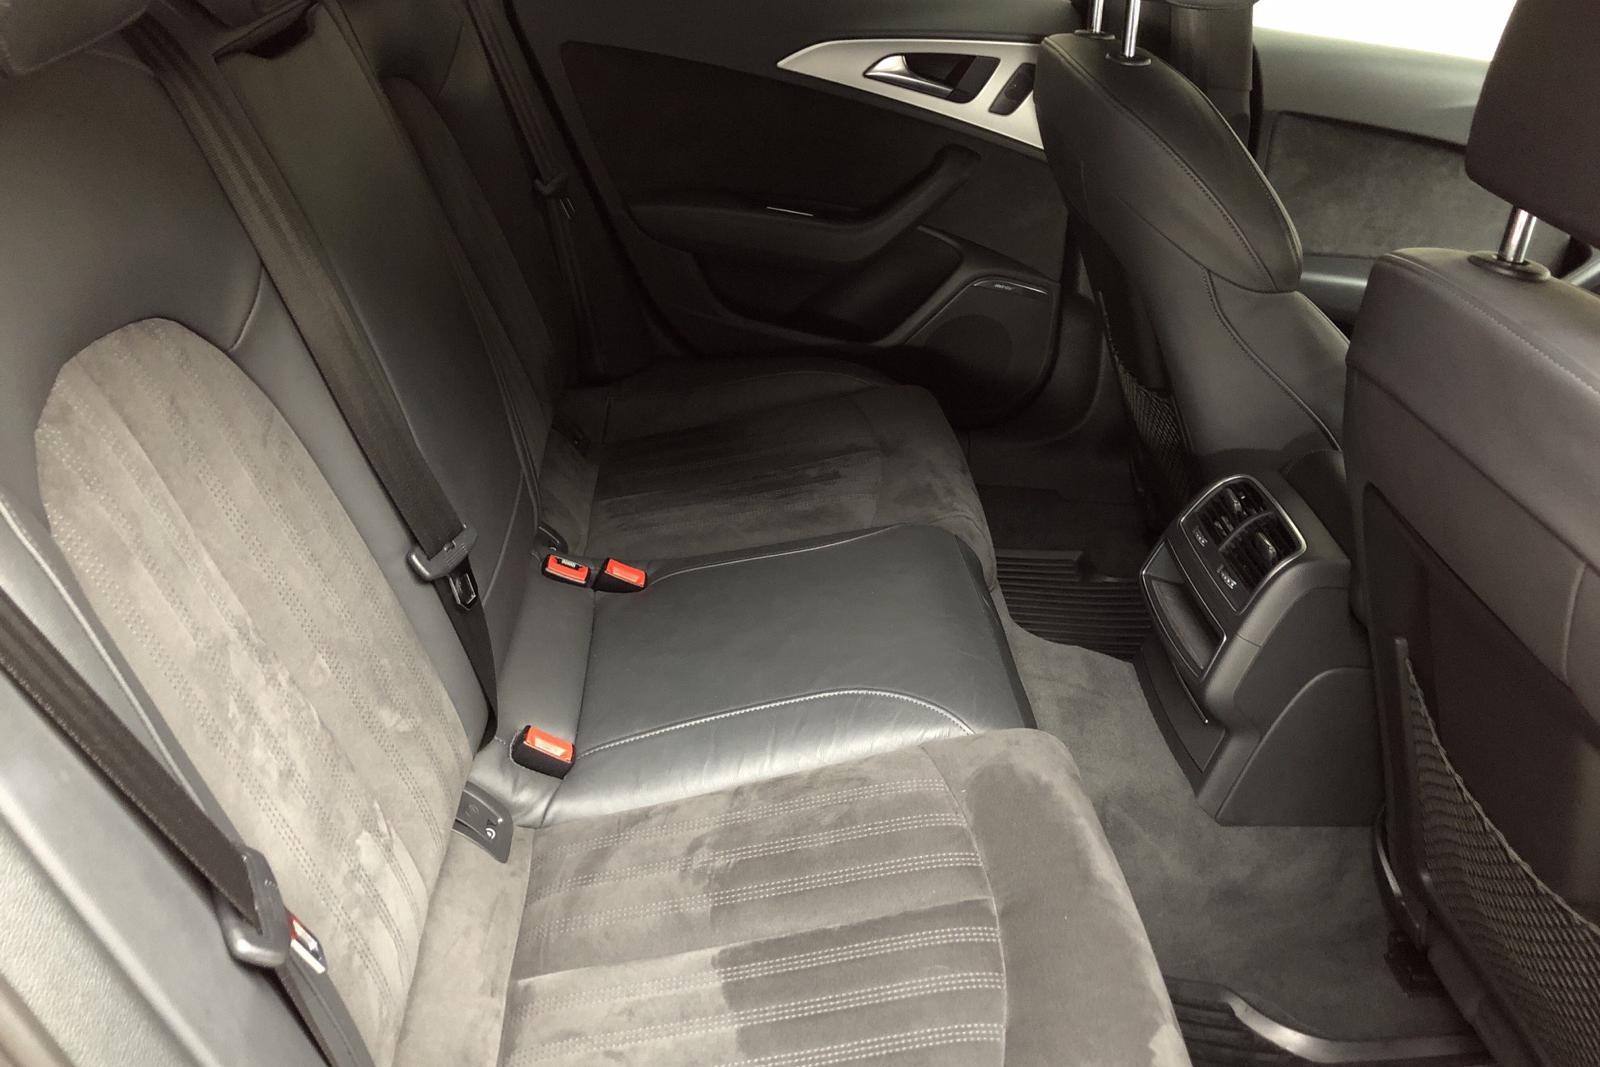 Audi A6 3.0 TDI quattro (218hk) - 97 000 km - Automatic - red - 2016